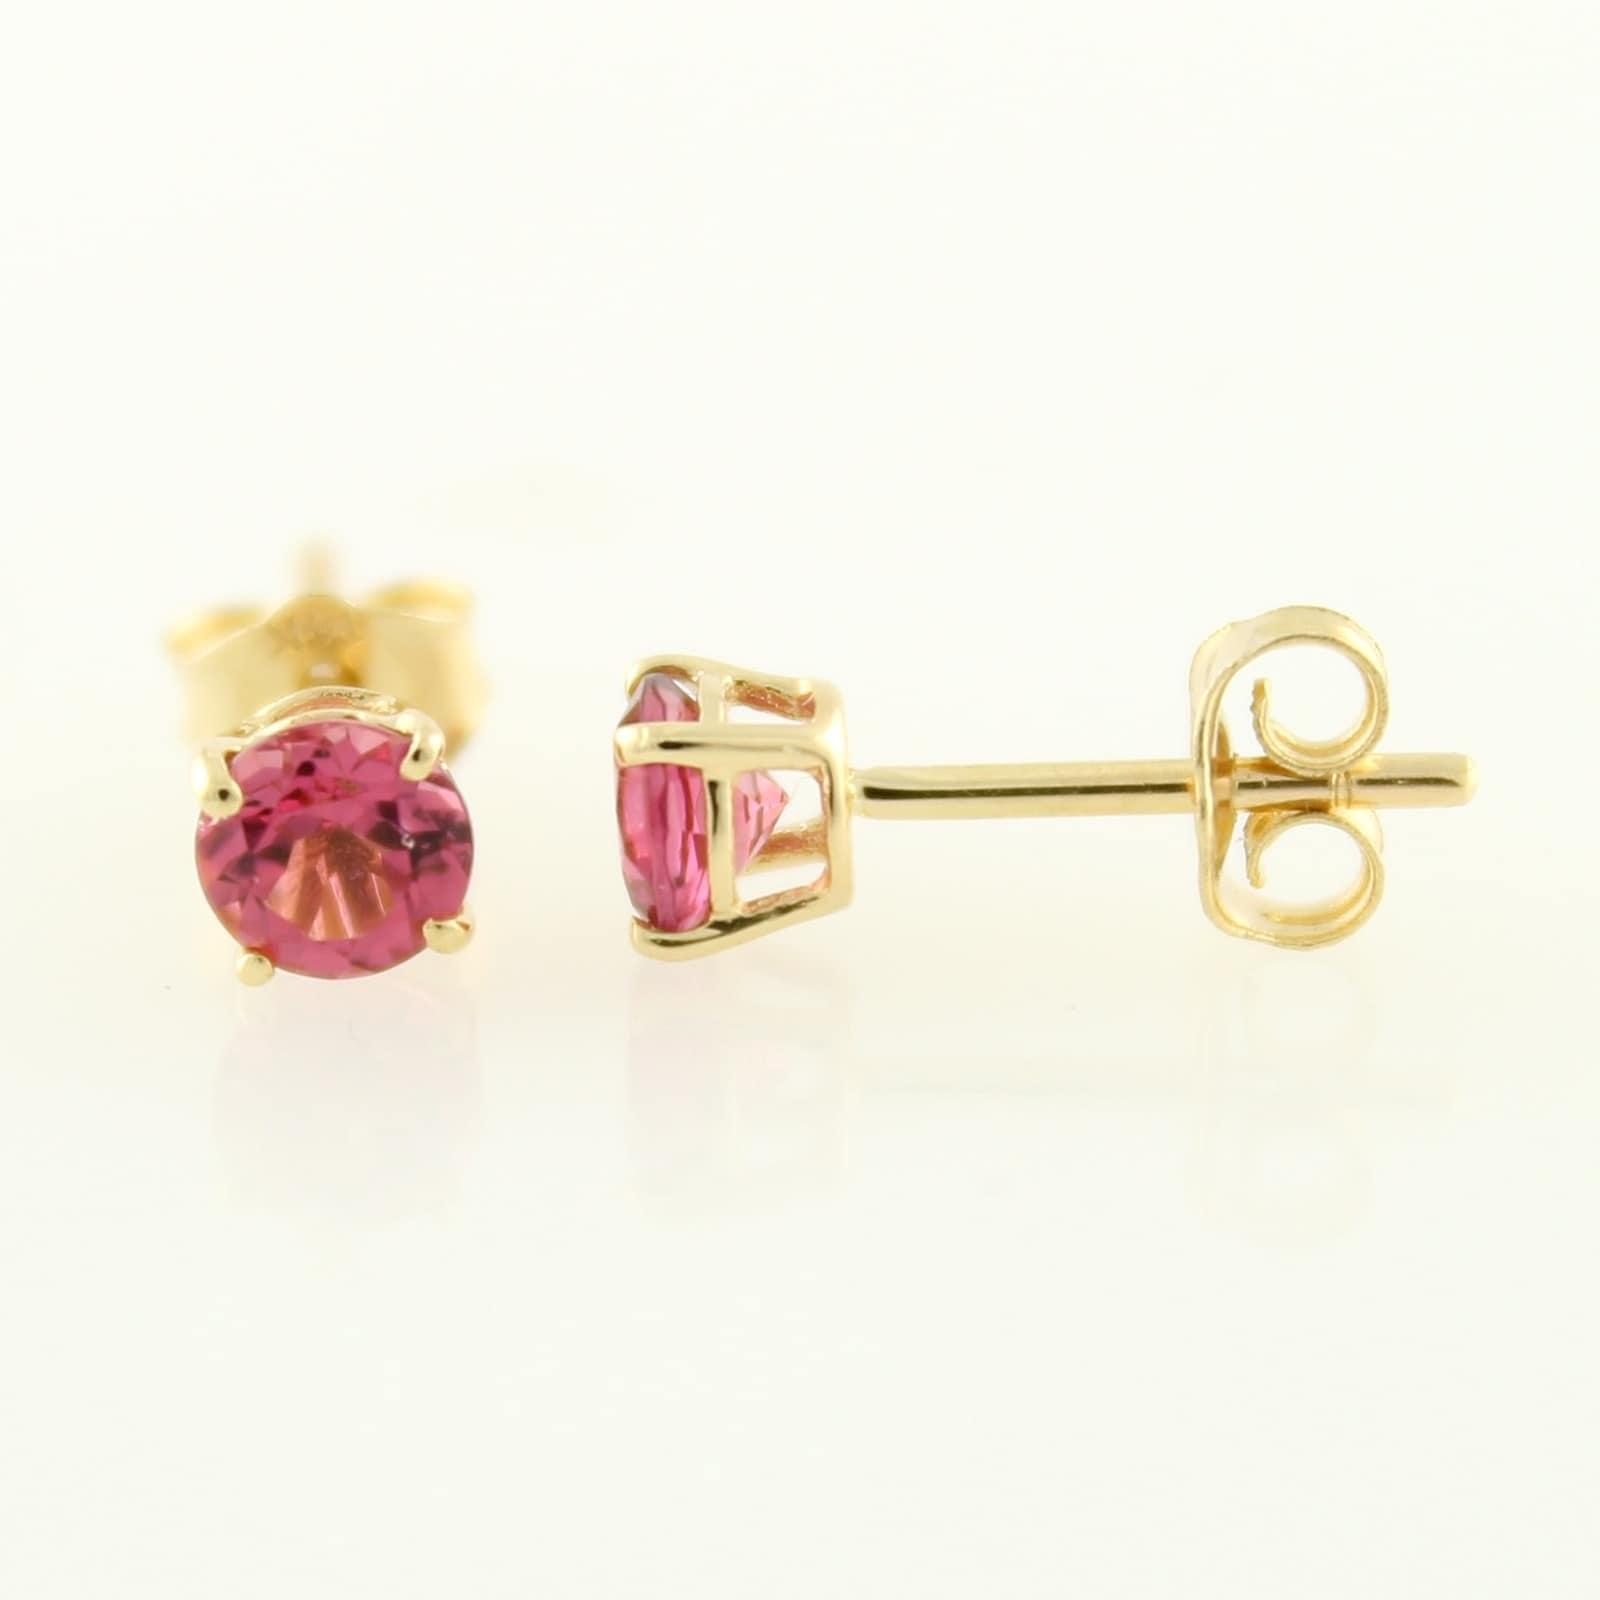 Pinctore 10k Yellow Gold Genuine Pink Tourmaline Topaz 4mm Round Stud Earrings